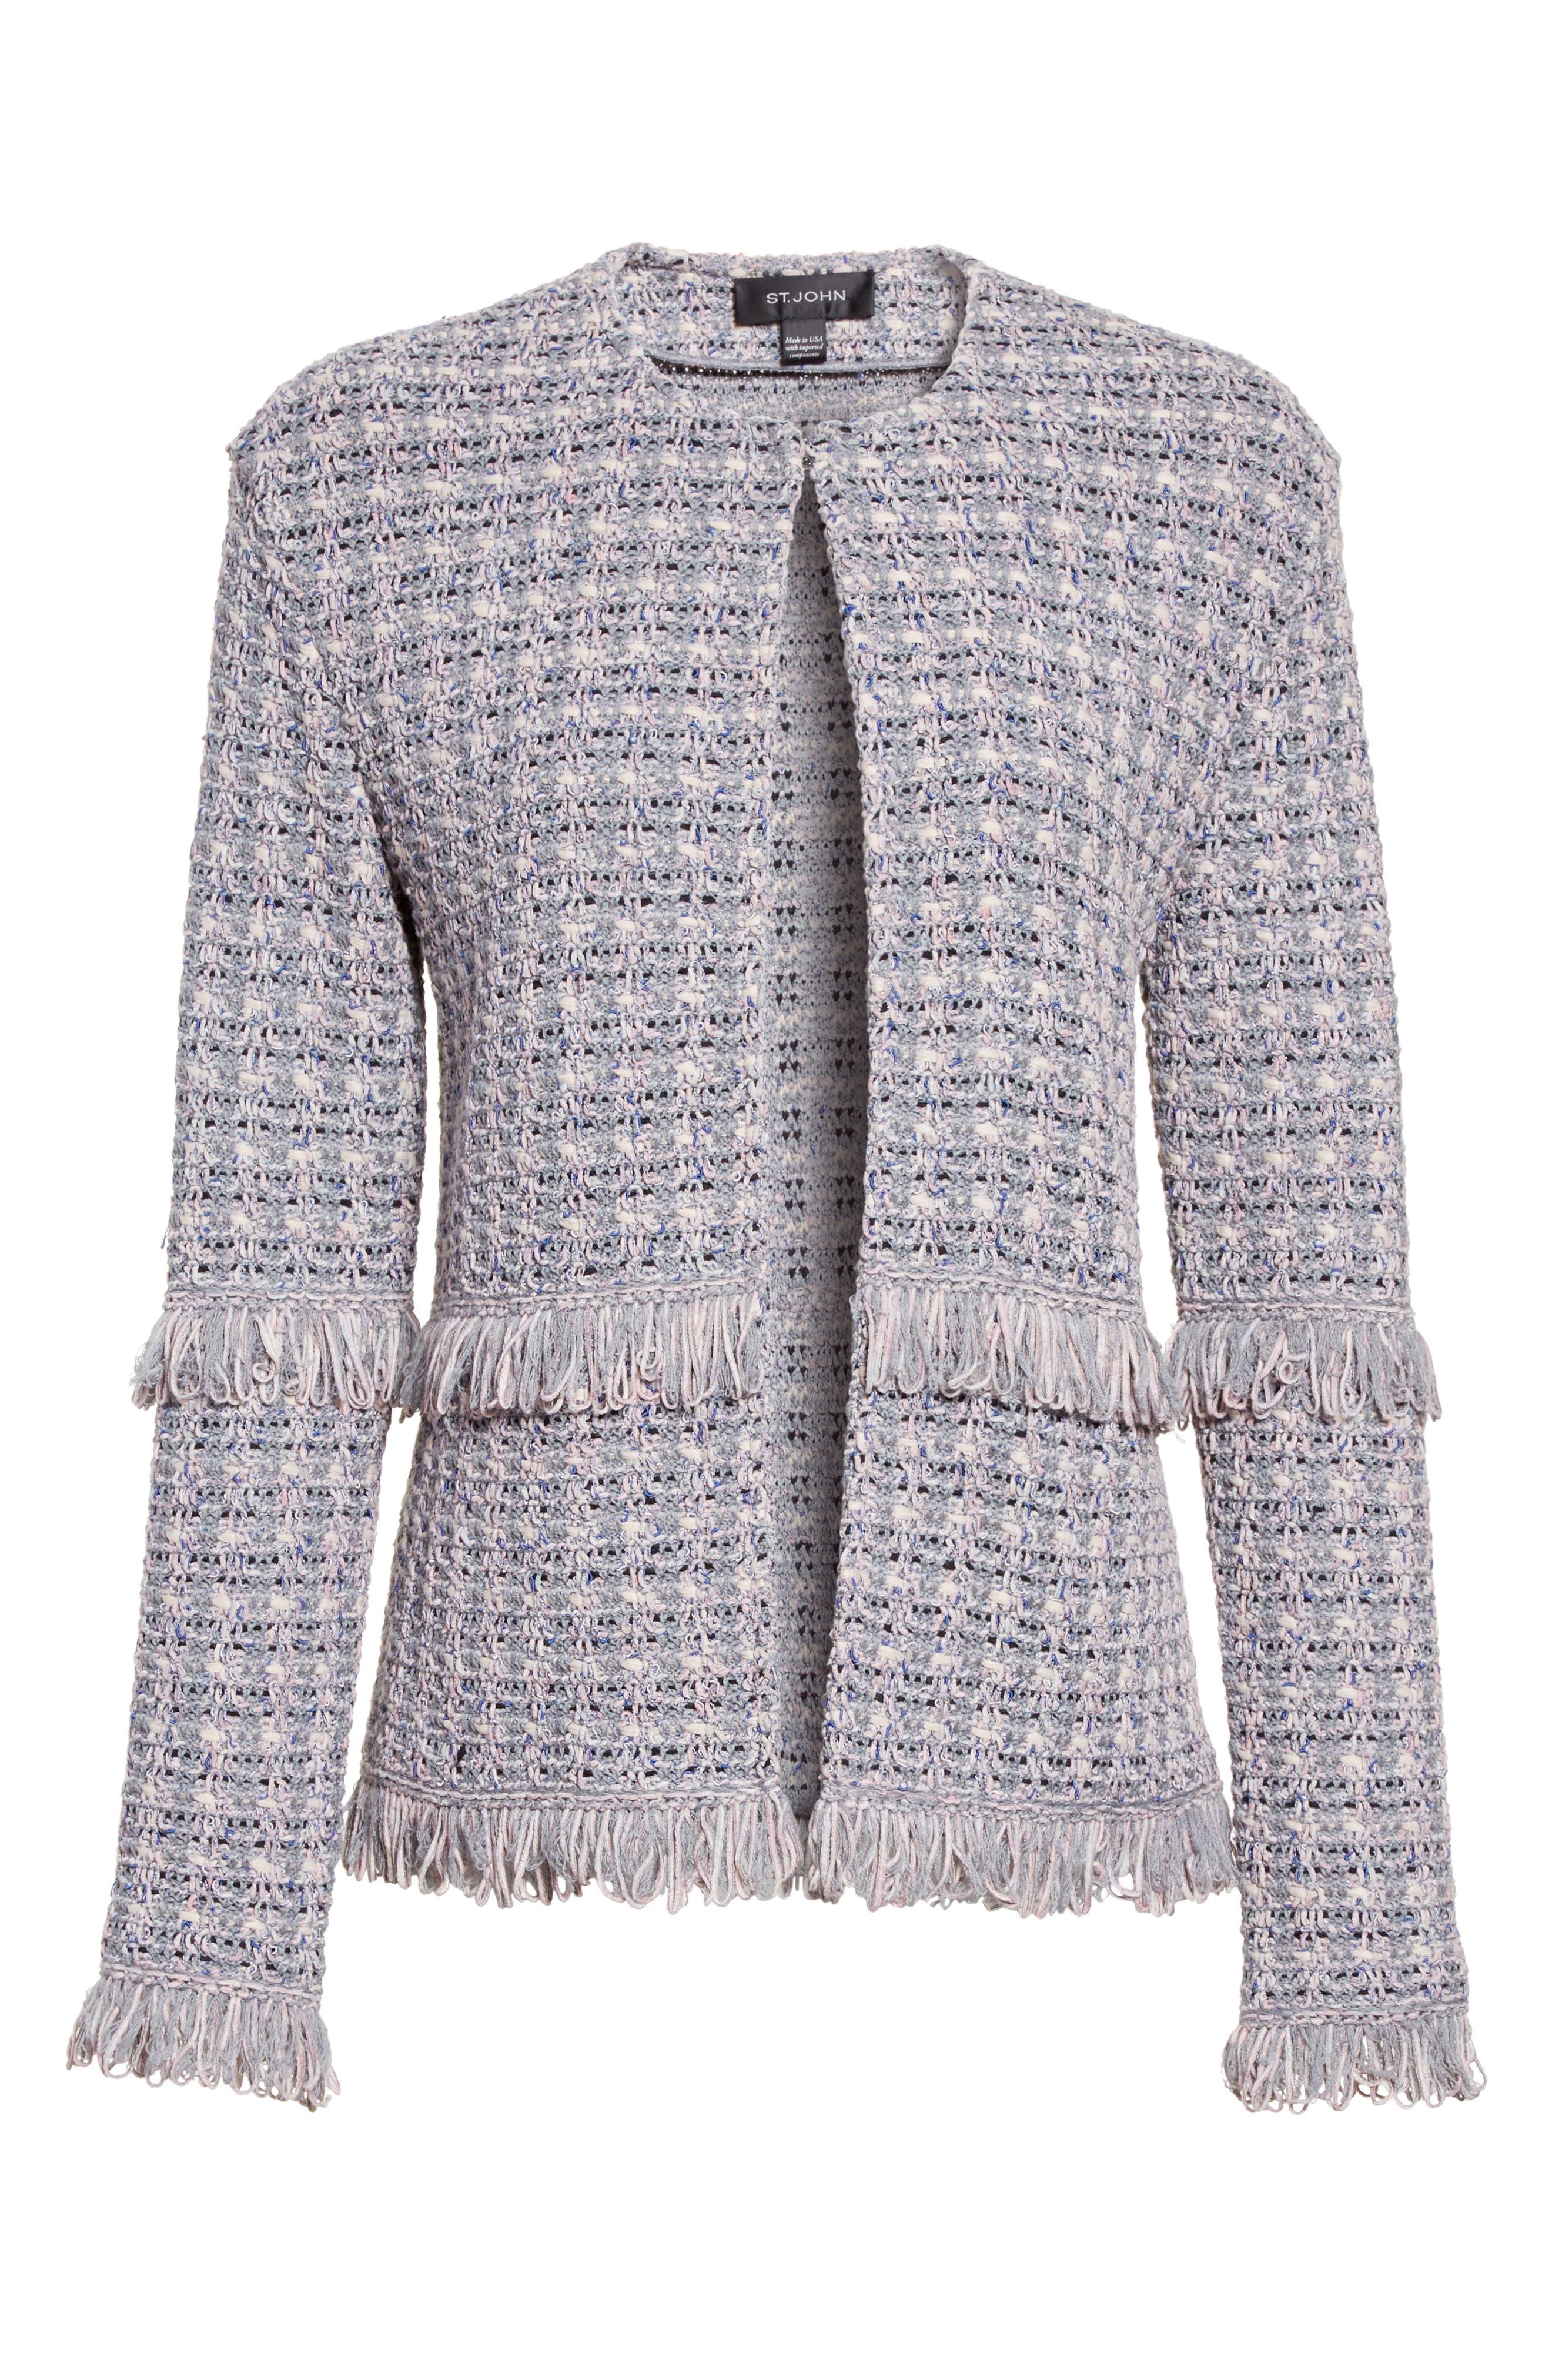 Textural Powder Tweed Jacket,                             Alternate thumbnail 6, color,                             020